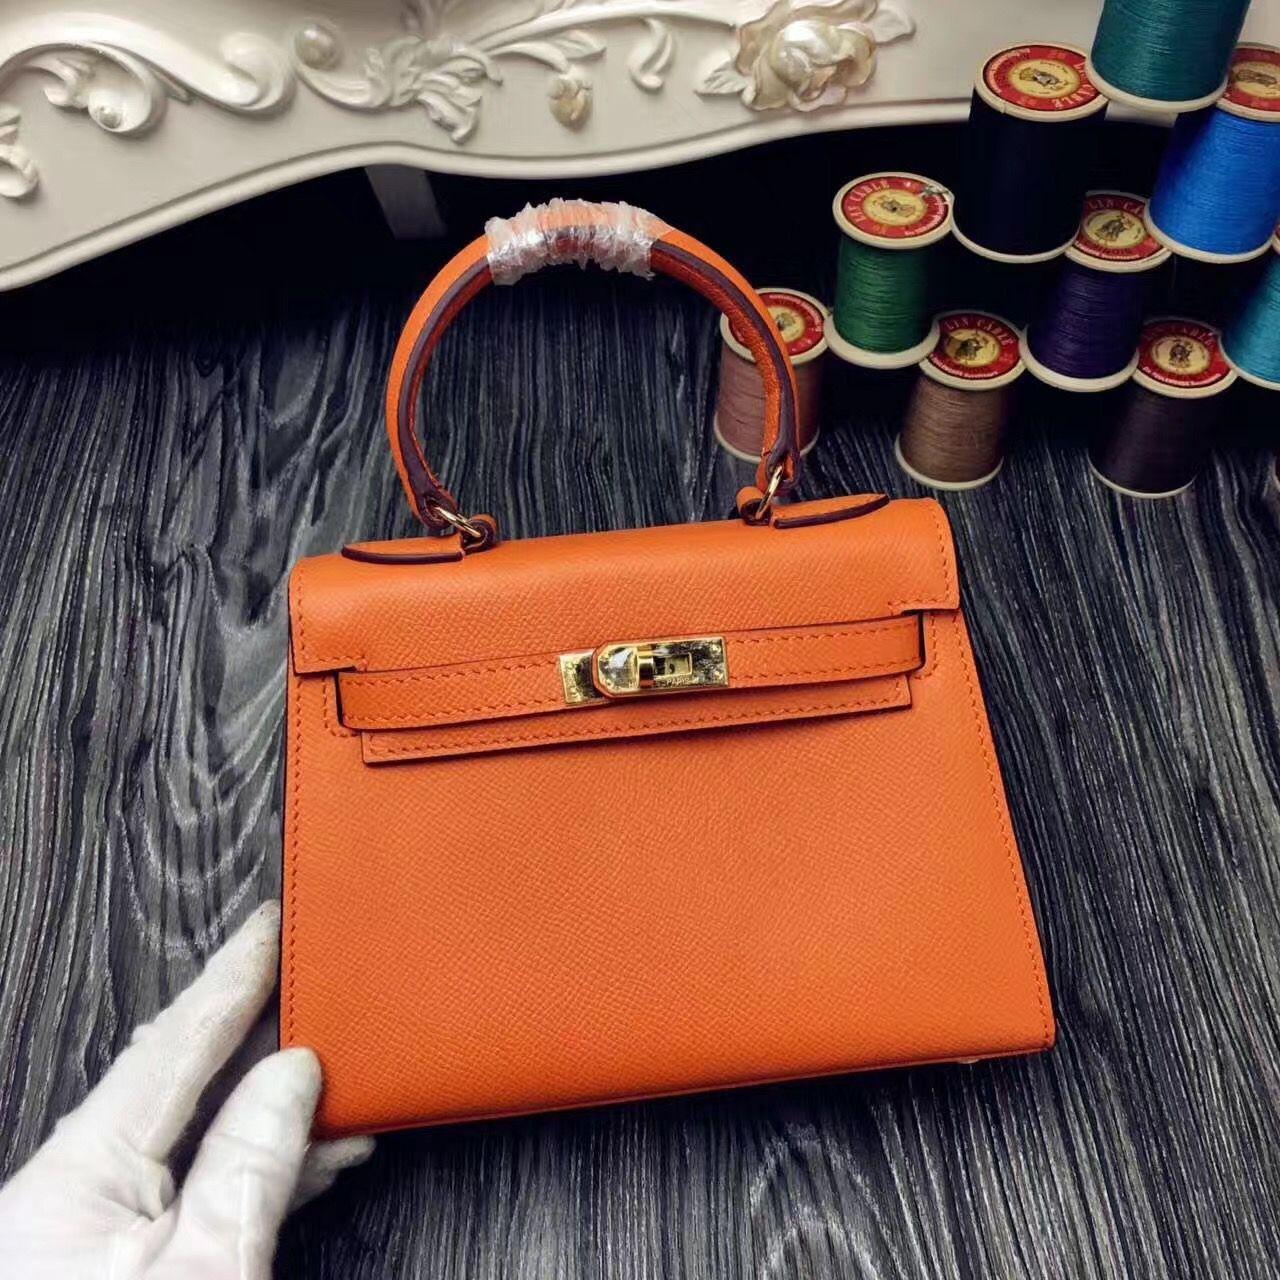 55481c597947 Hermes Original Epsom Leather Kelly 20cm Mini Bag Orange